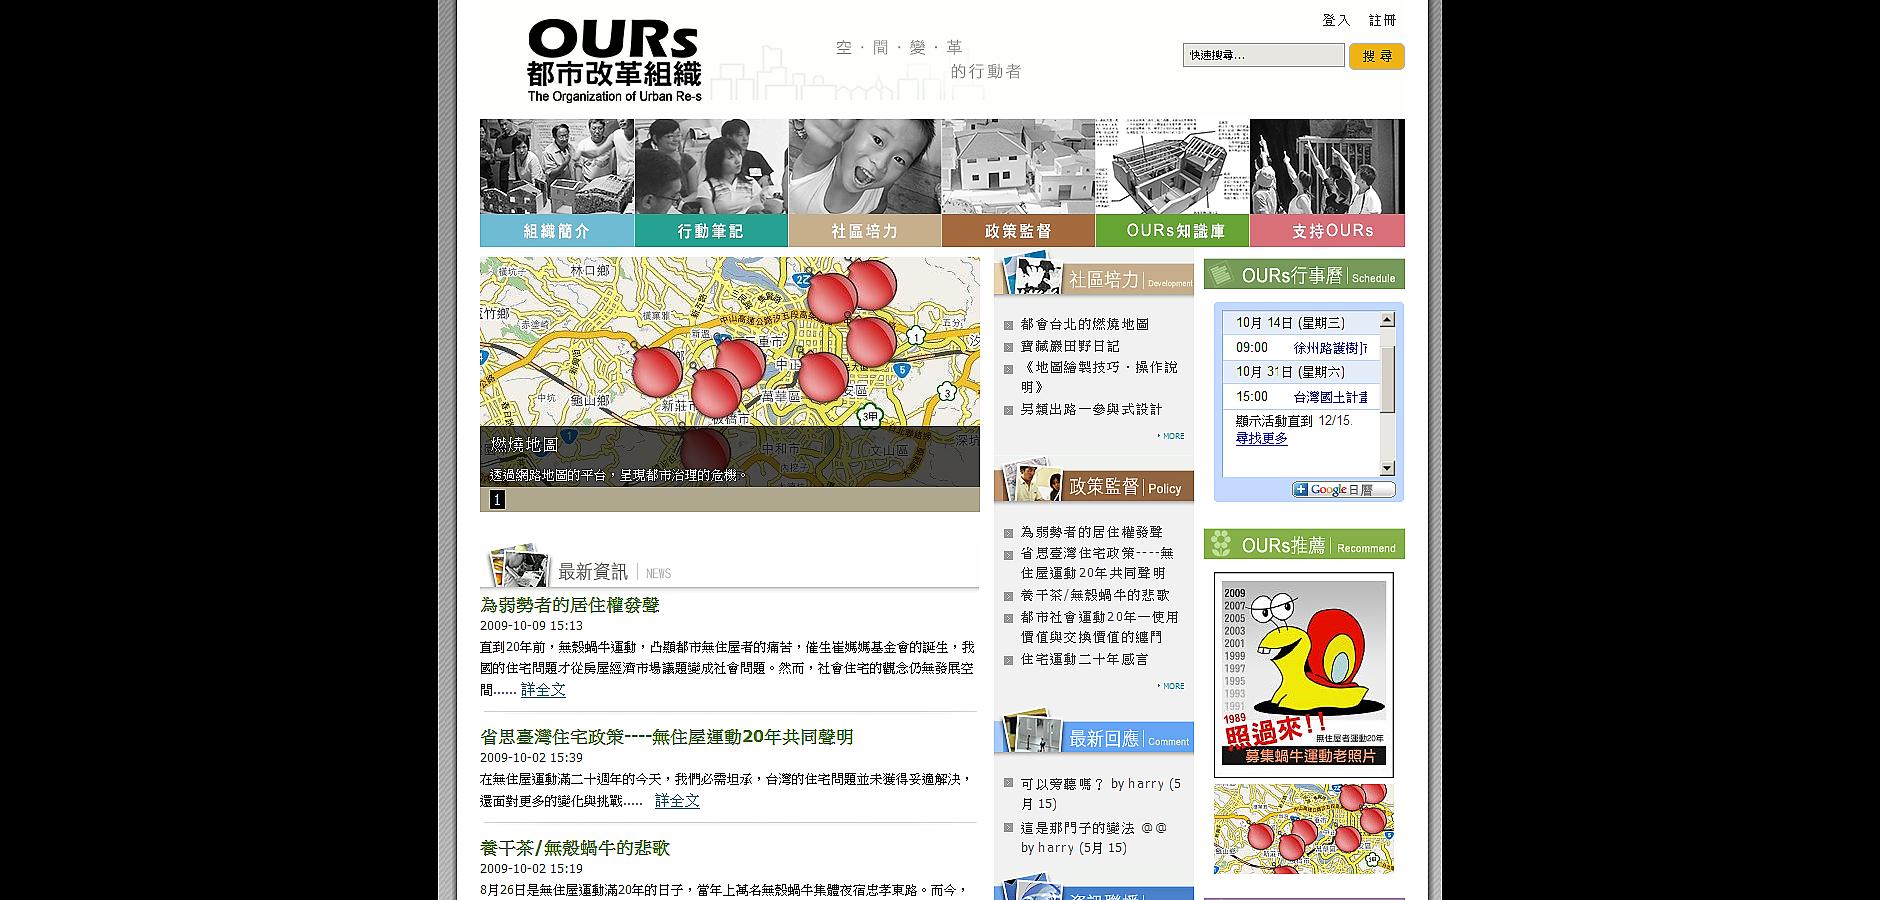 OURs 專業者都市改革組織